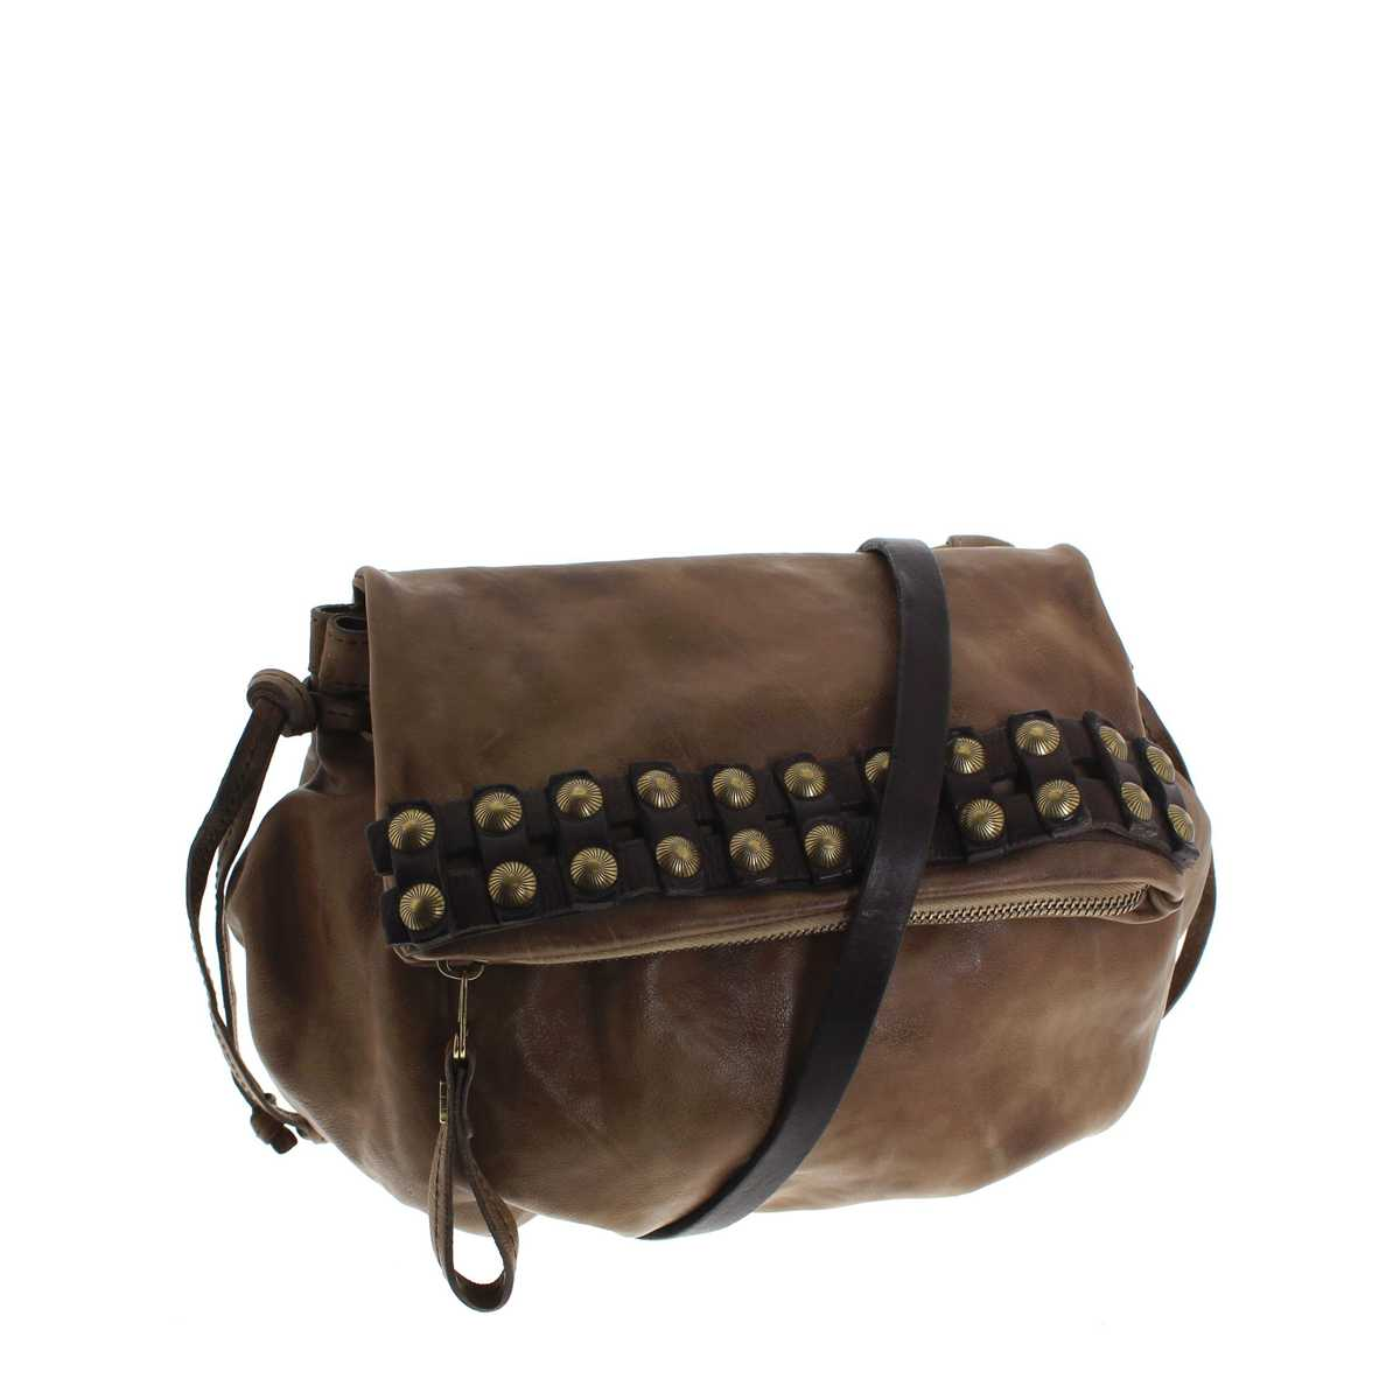 A.S. 98 BORSE 200335-0101 Rino Leather bag - brown